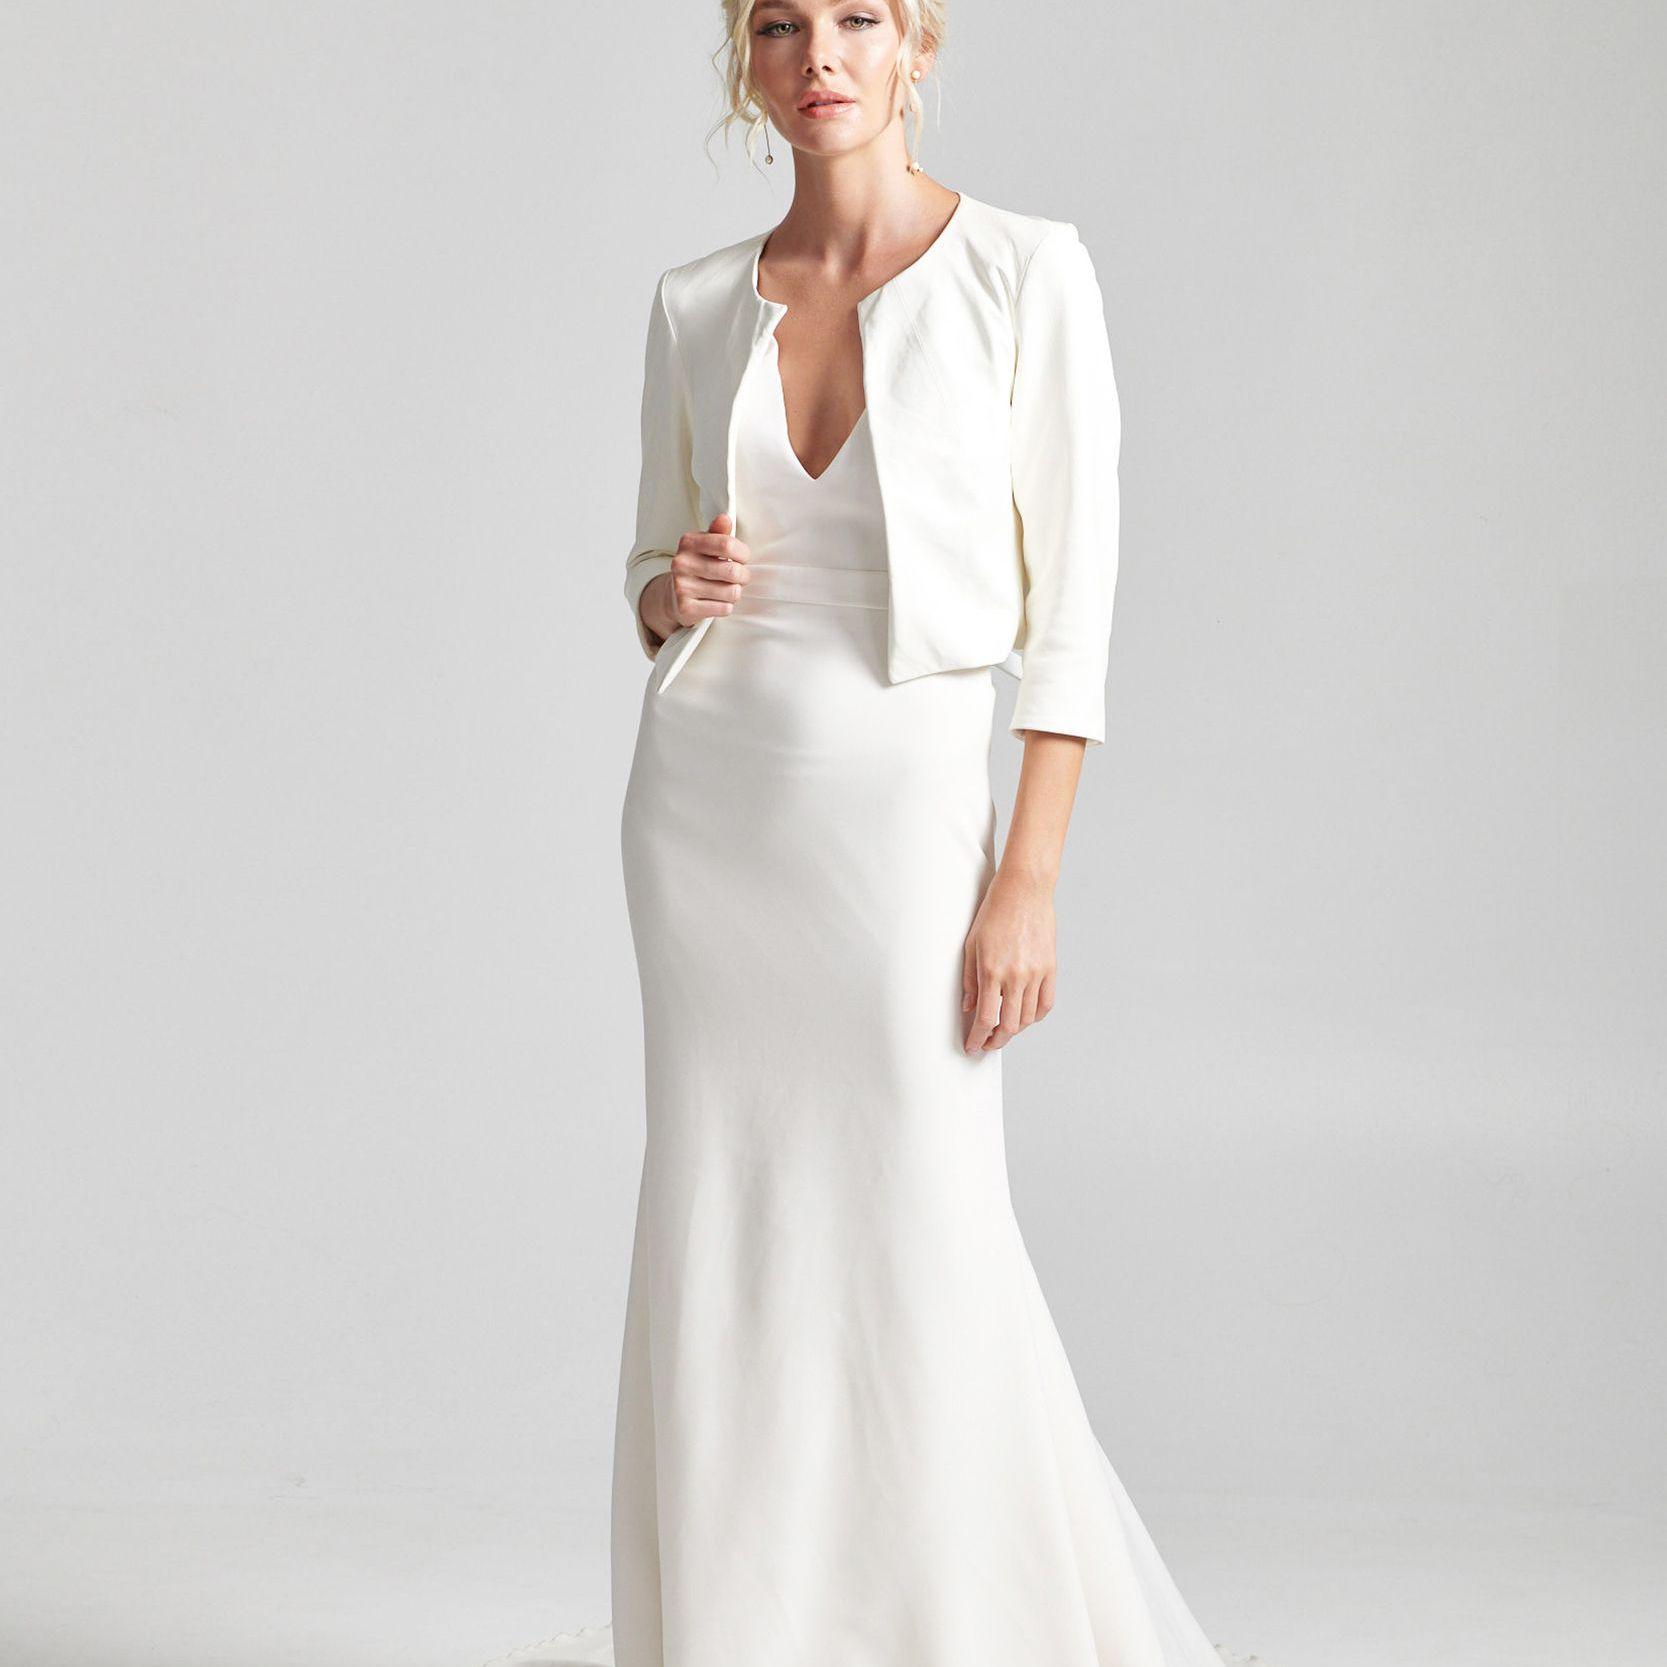 Model in V-neck wedding dress with white cropped jacket